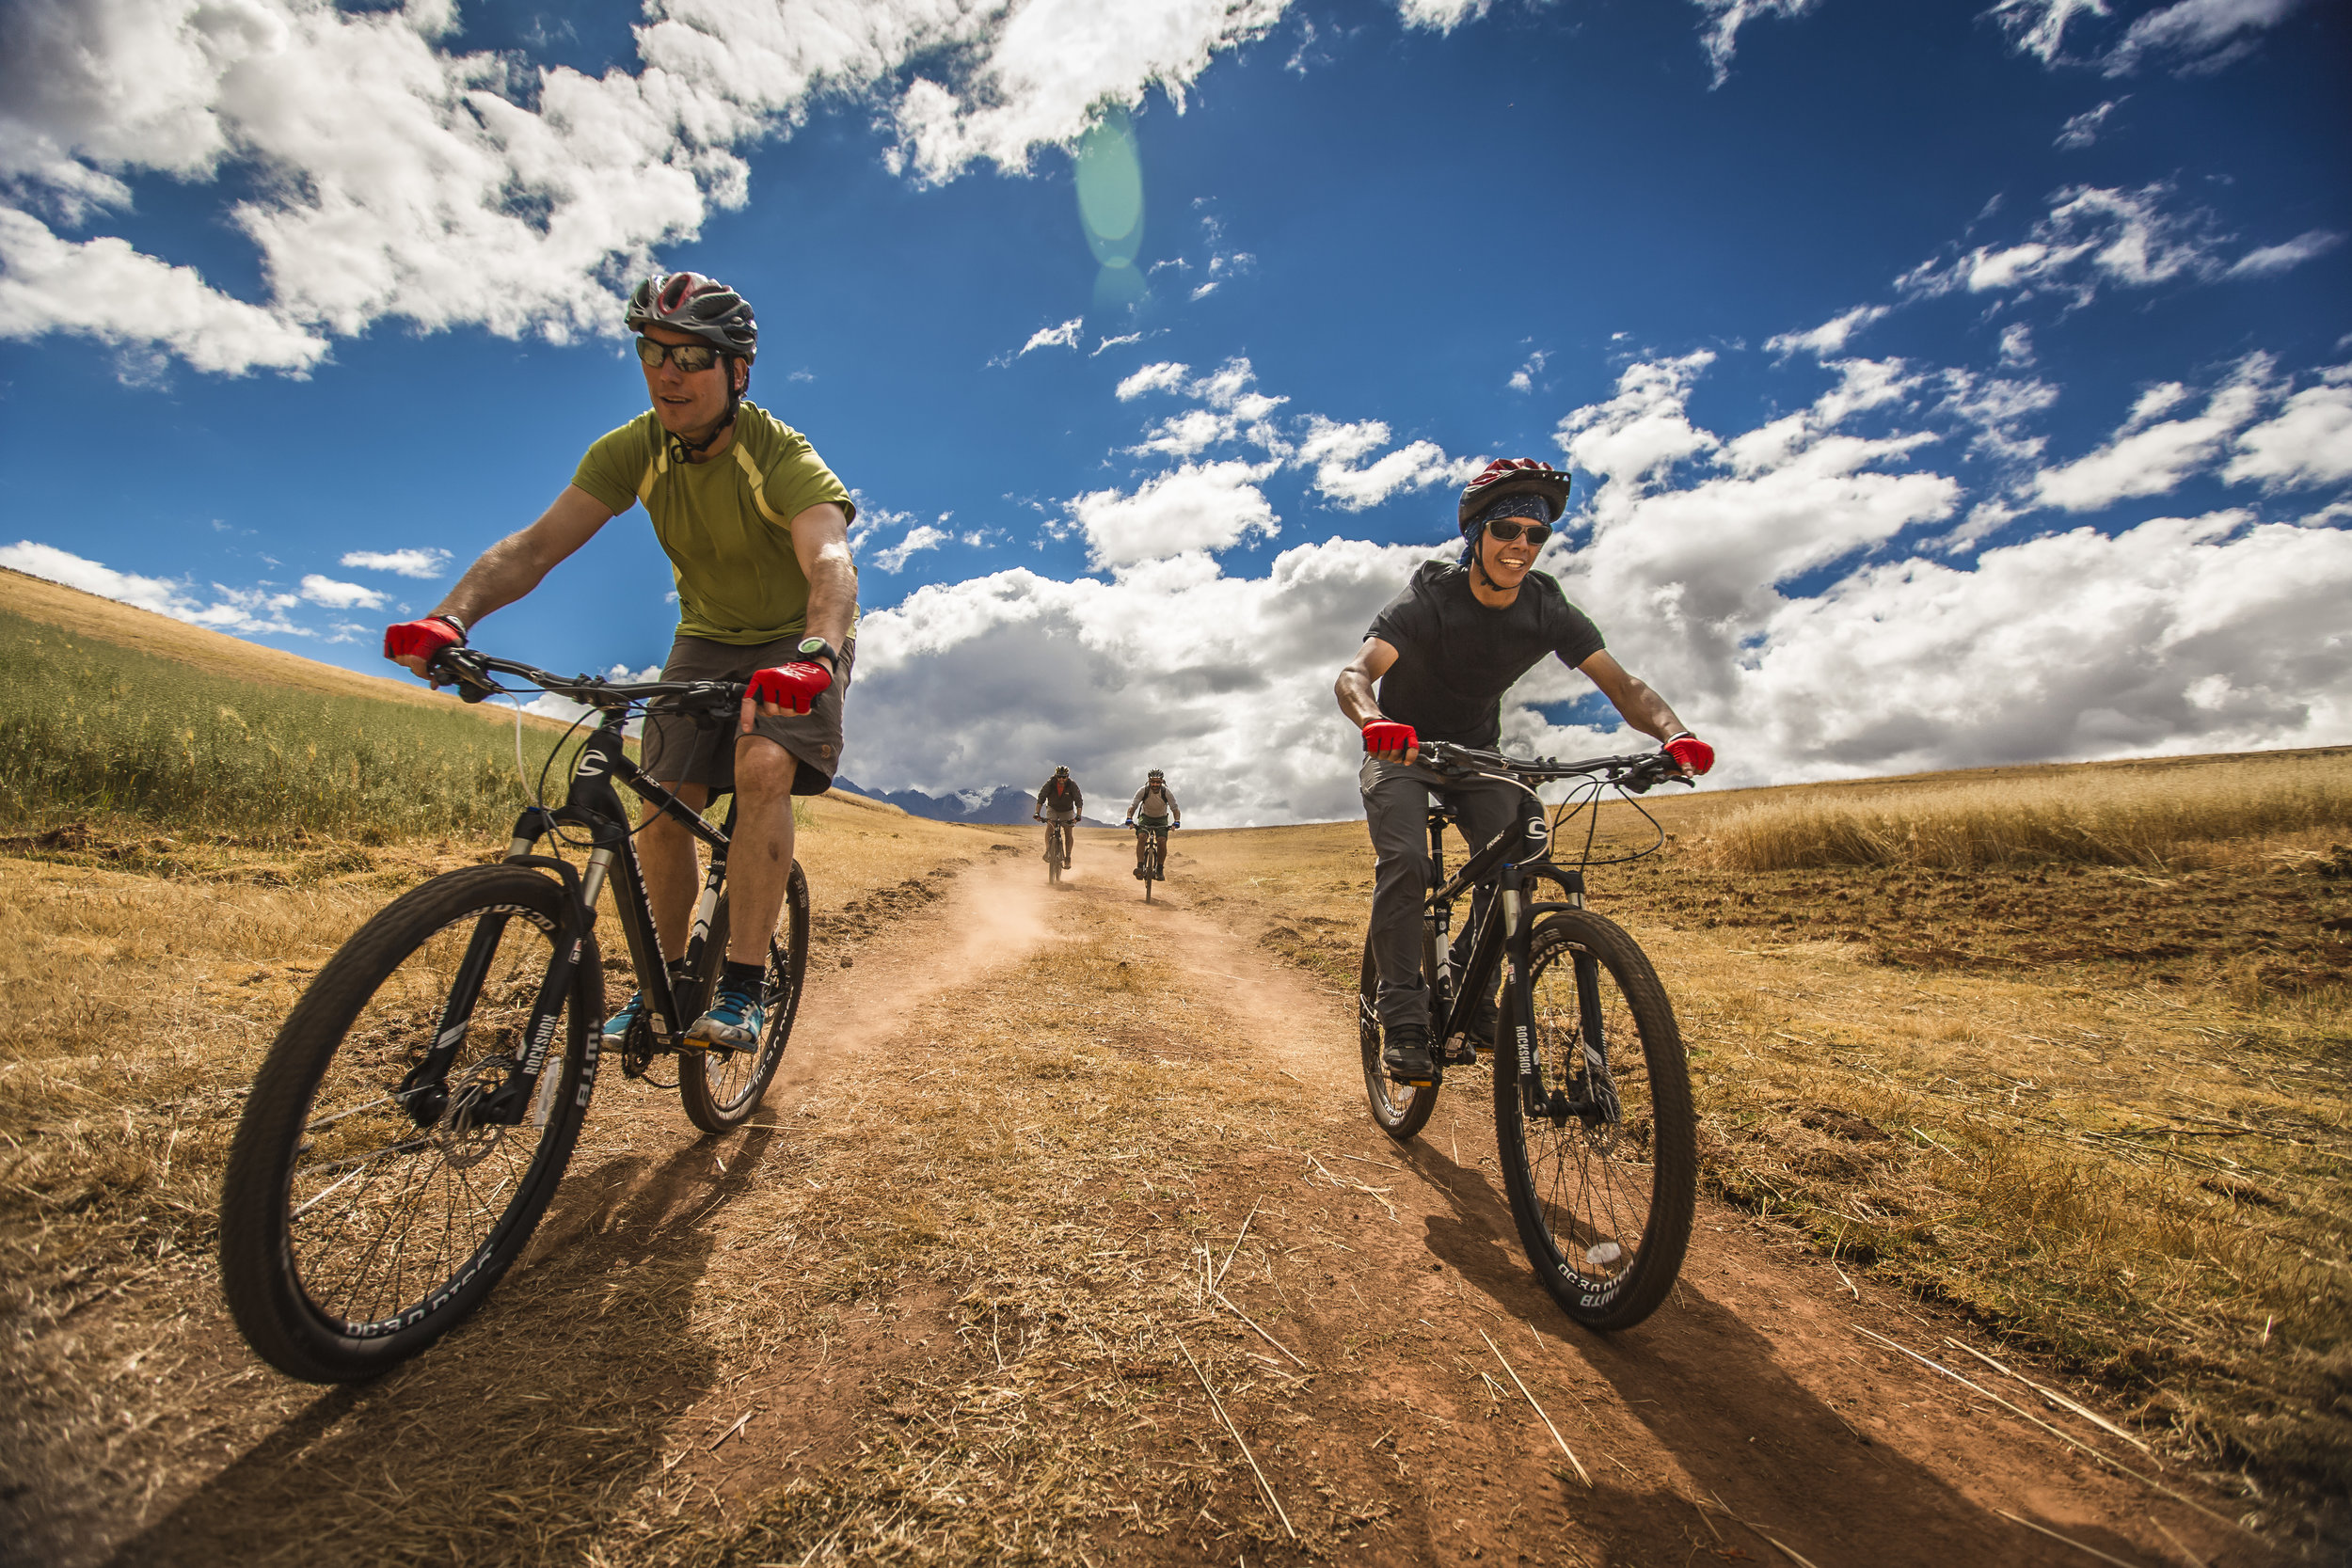 Biking Excursion with Explora Sacred Valley